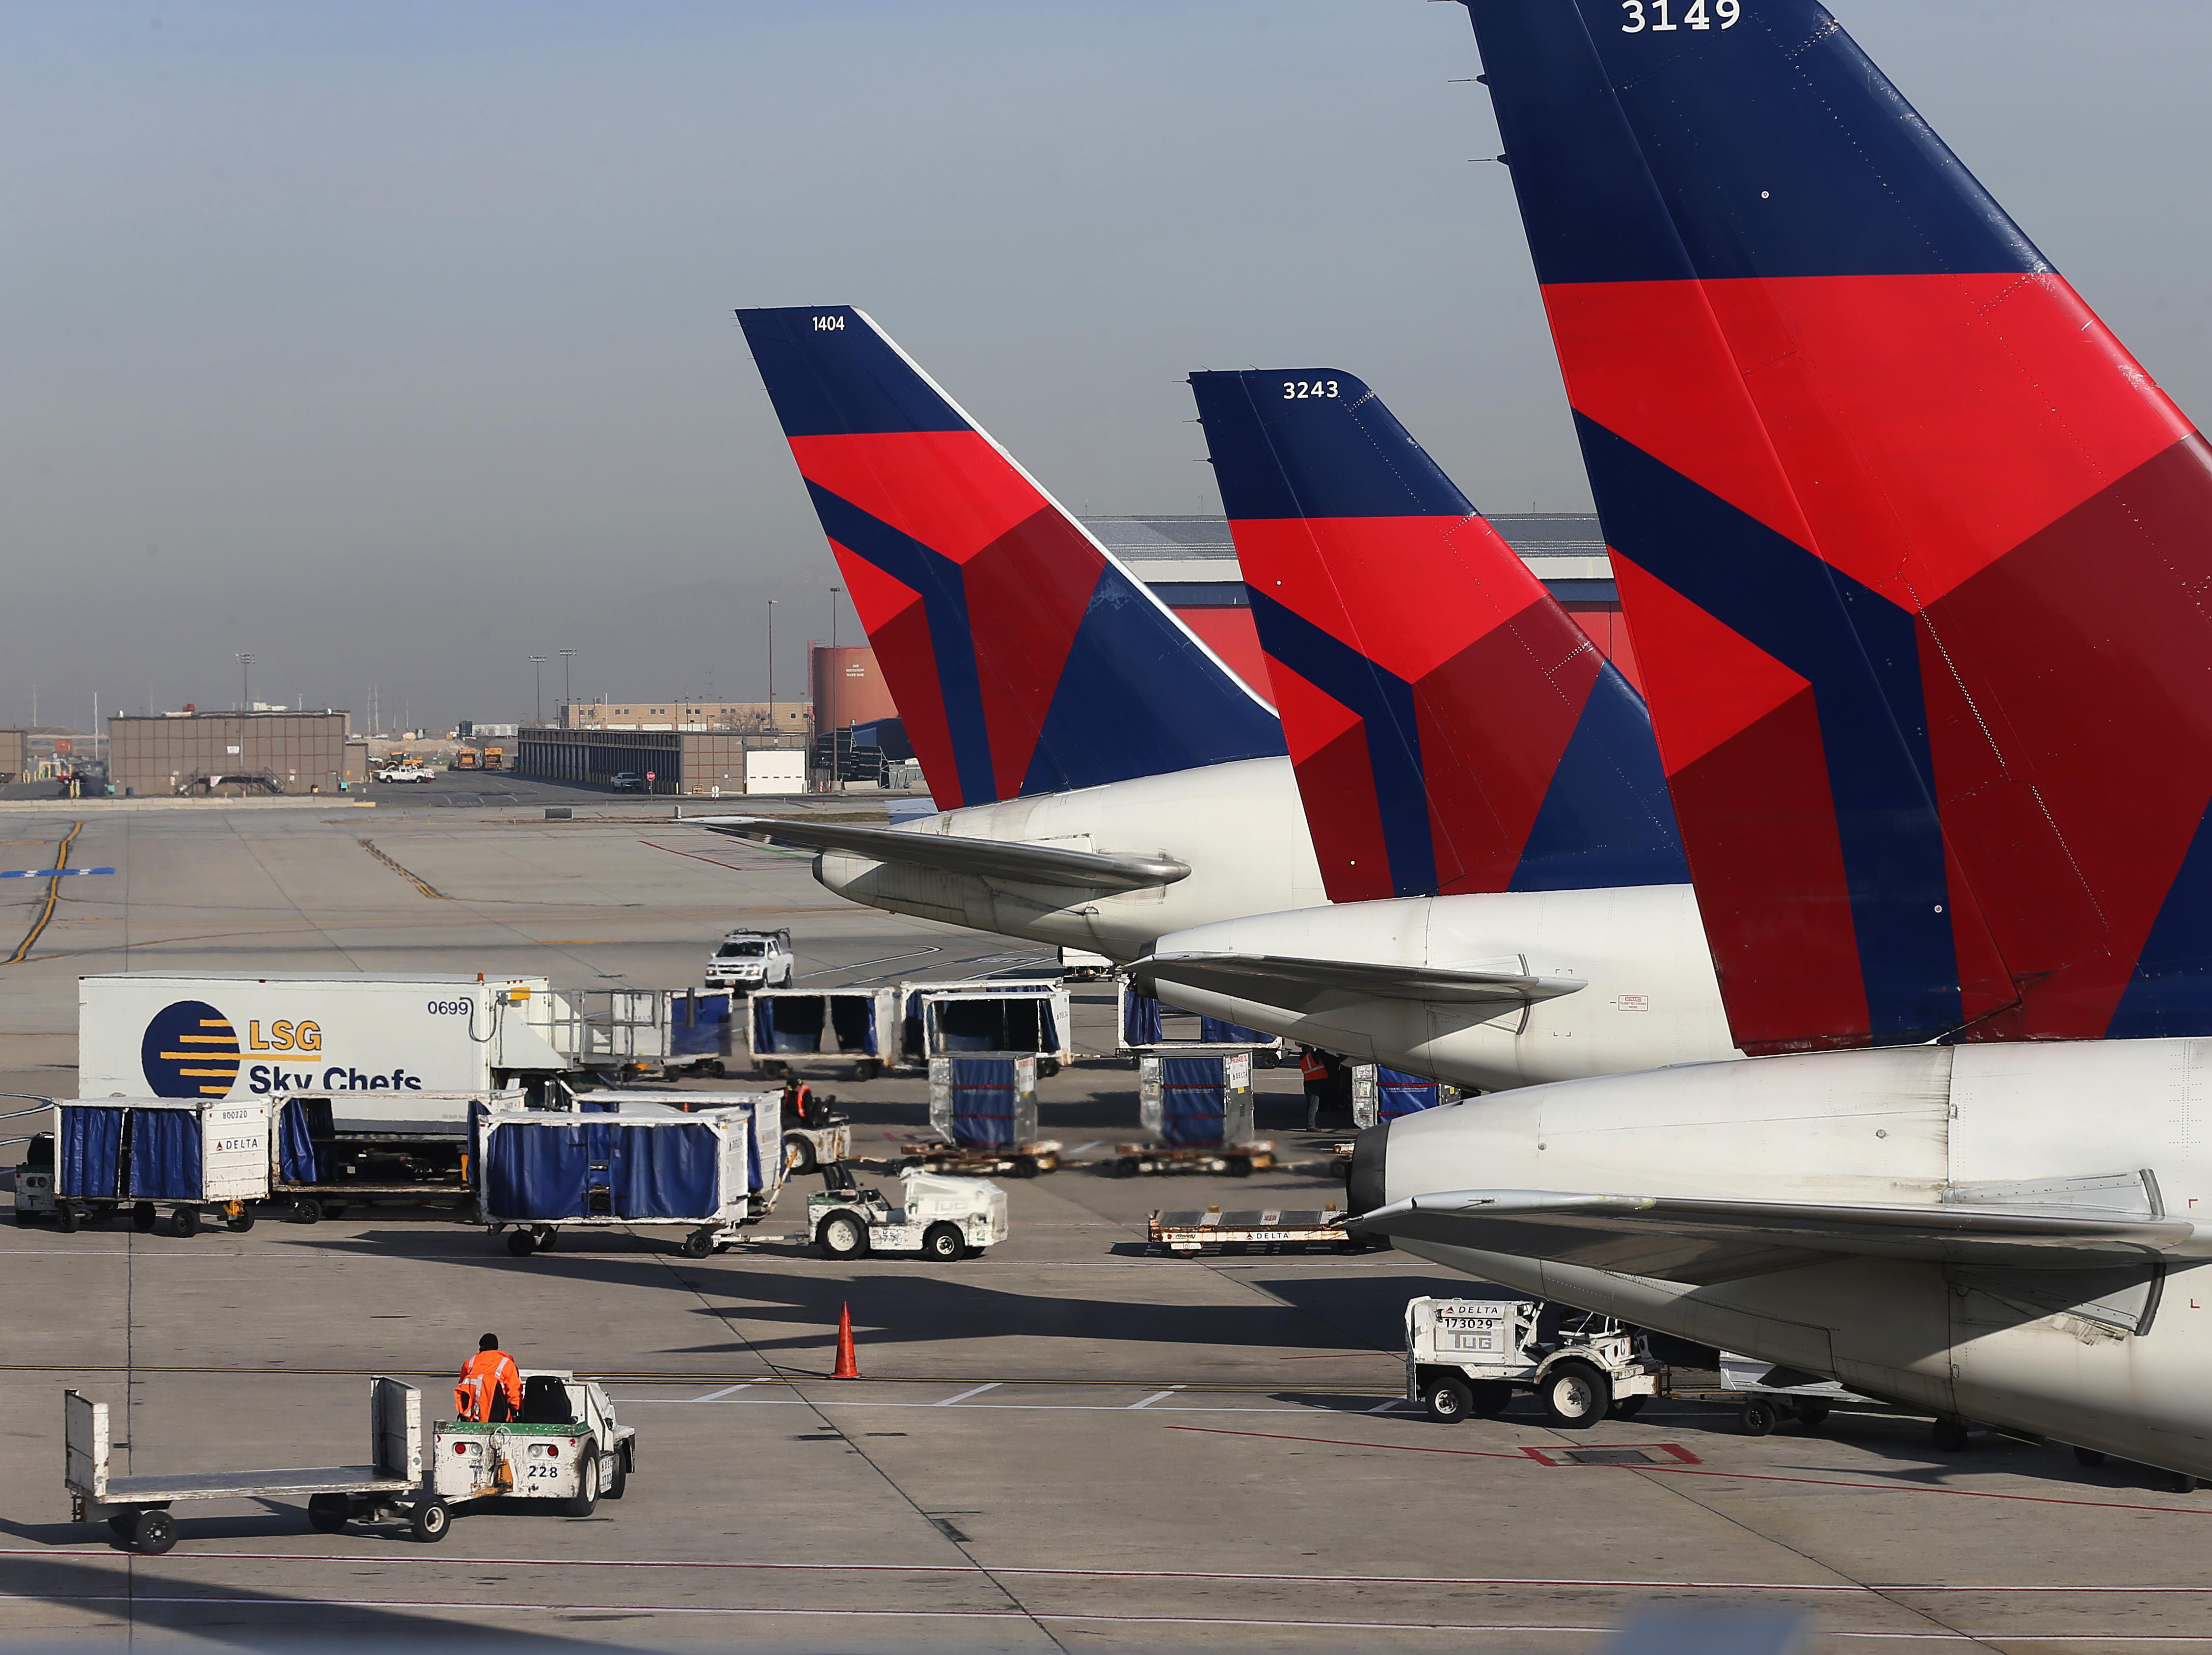 Delta planes at the Salt Lake City international Airport on November 27, 2013 in Salt Lake City, Utah.